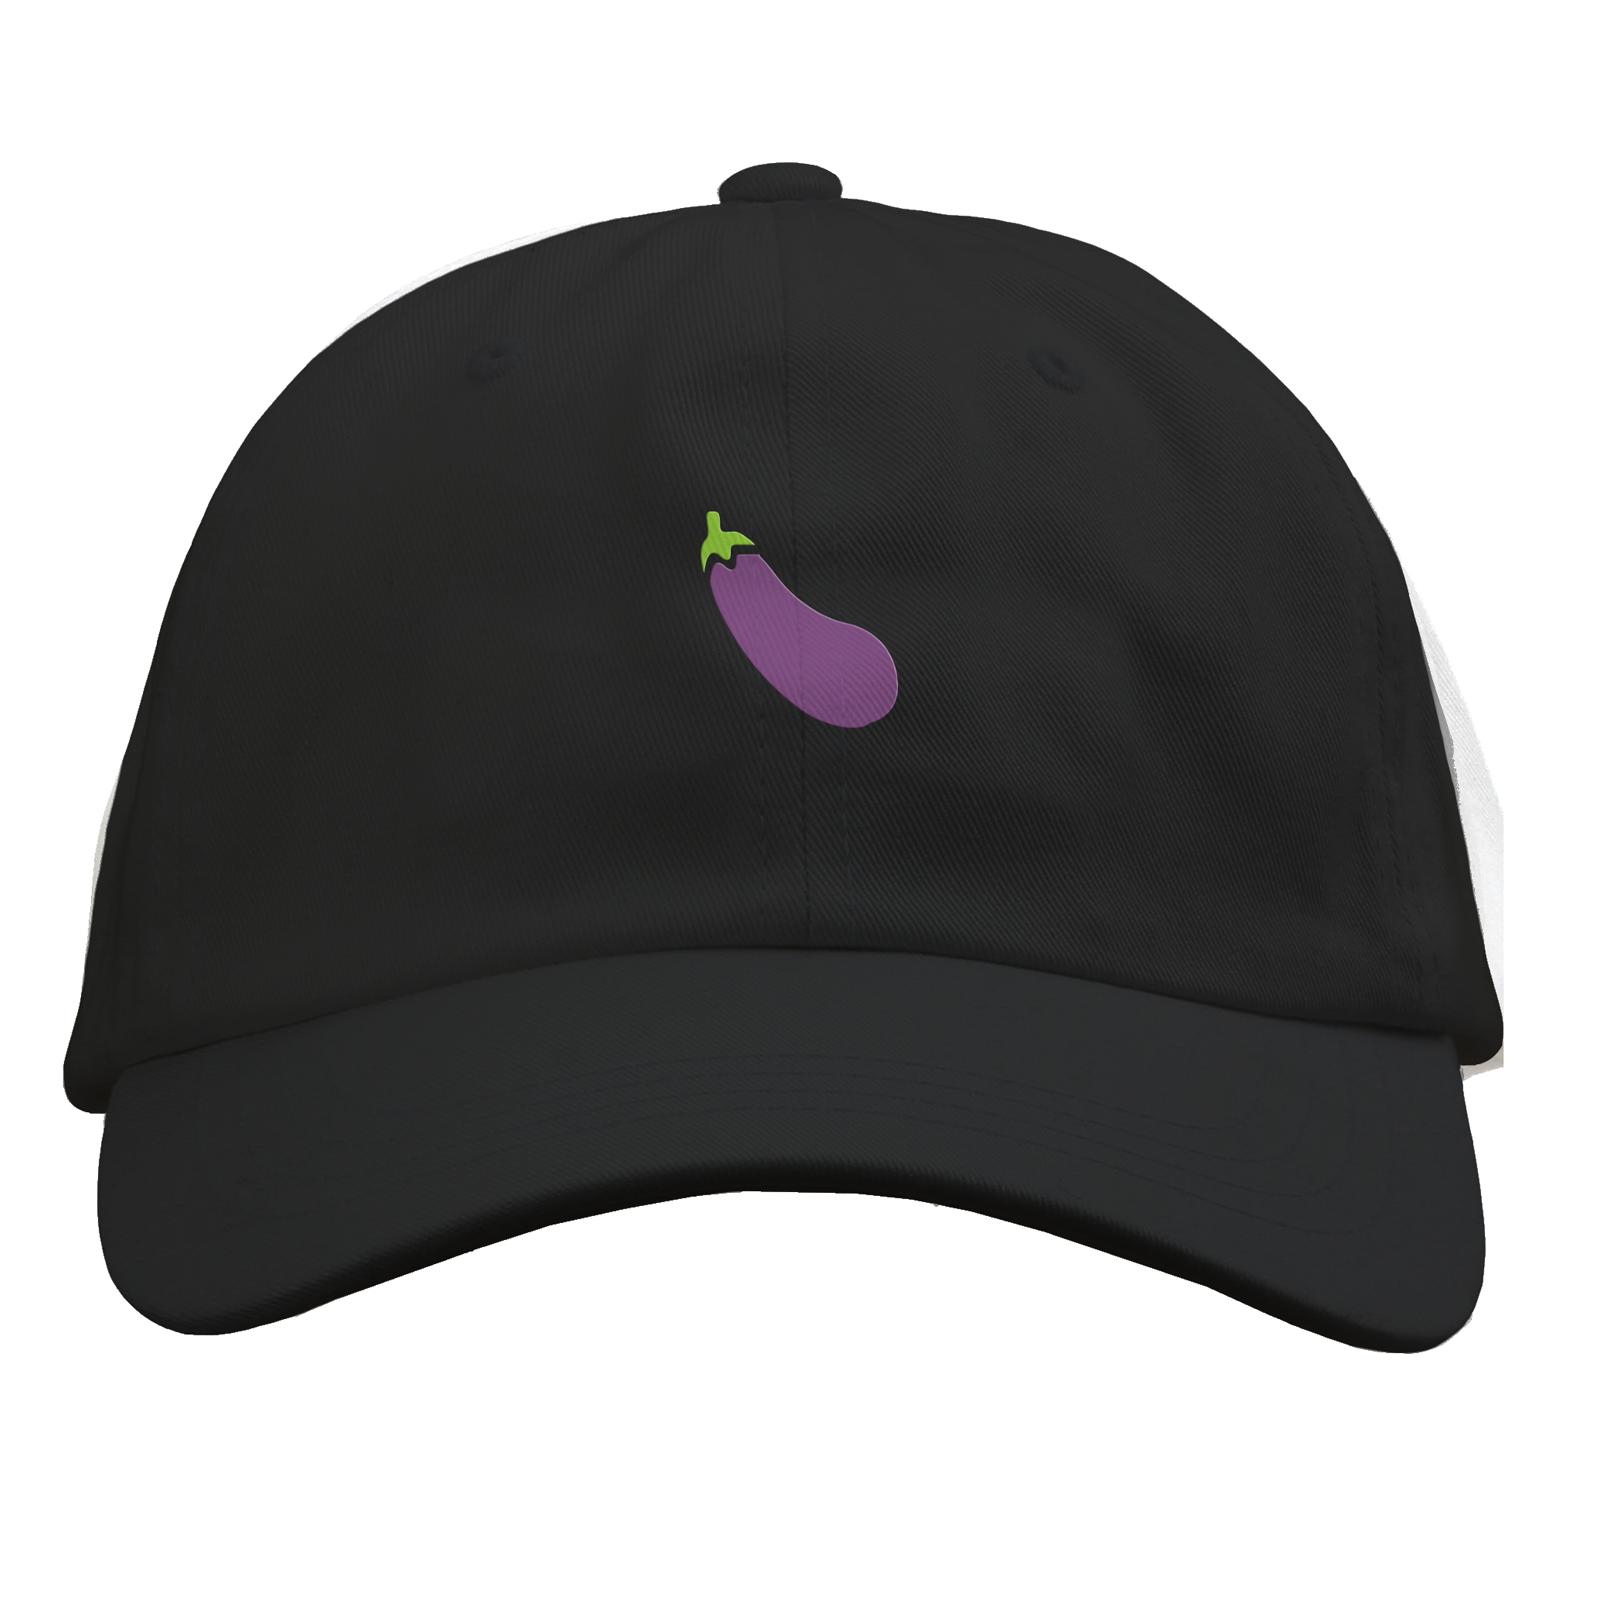 Eggplant Black Dad Hat